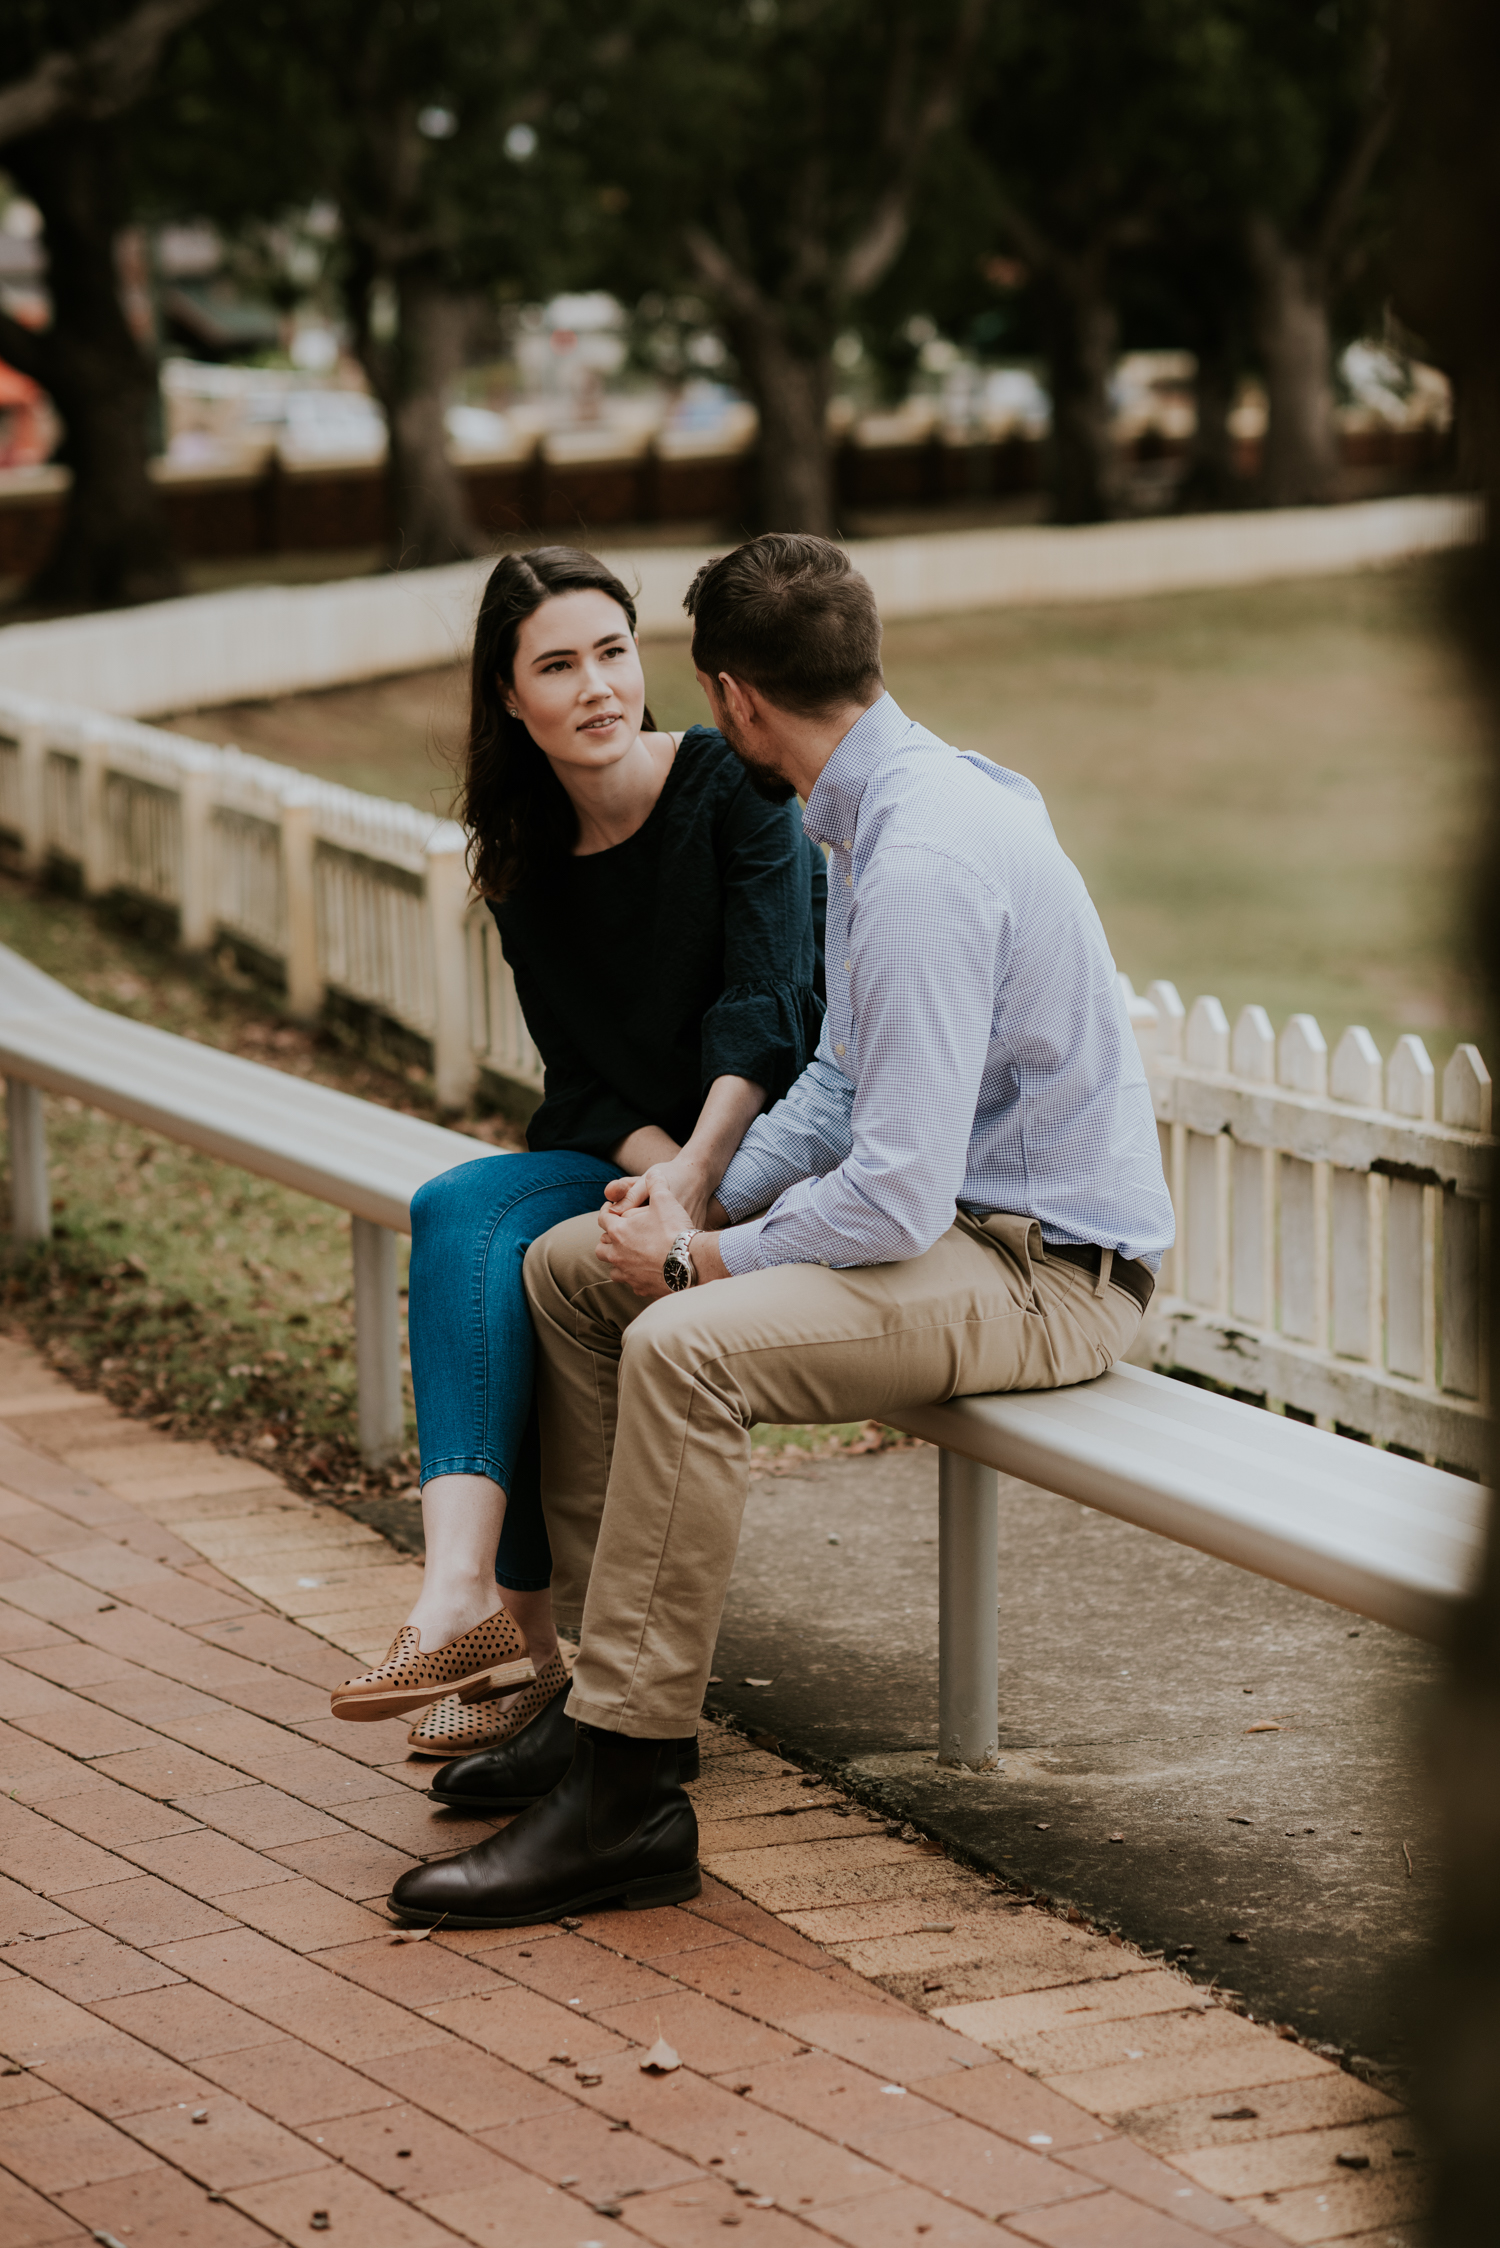 Brisbane Wedding Photographer | Engagement-Elopement Photography-2.jpg